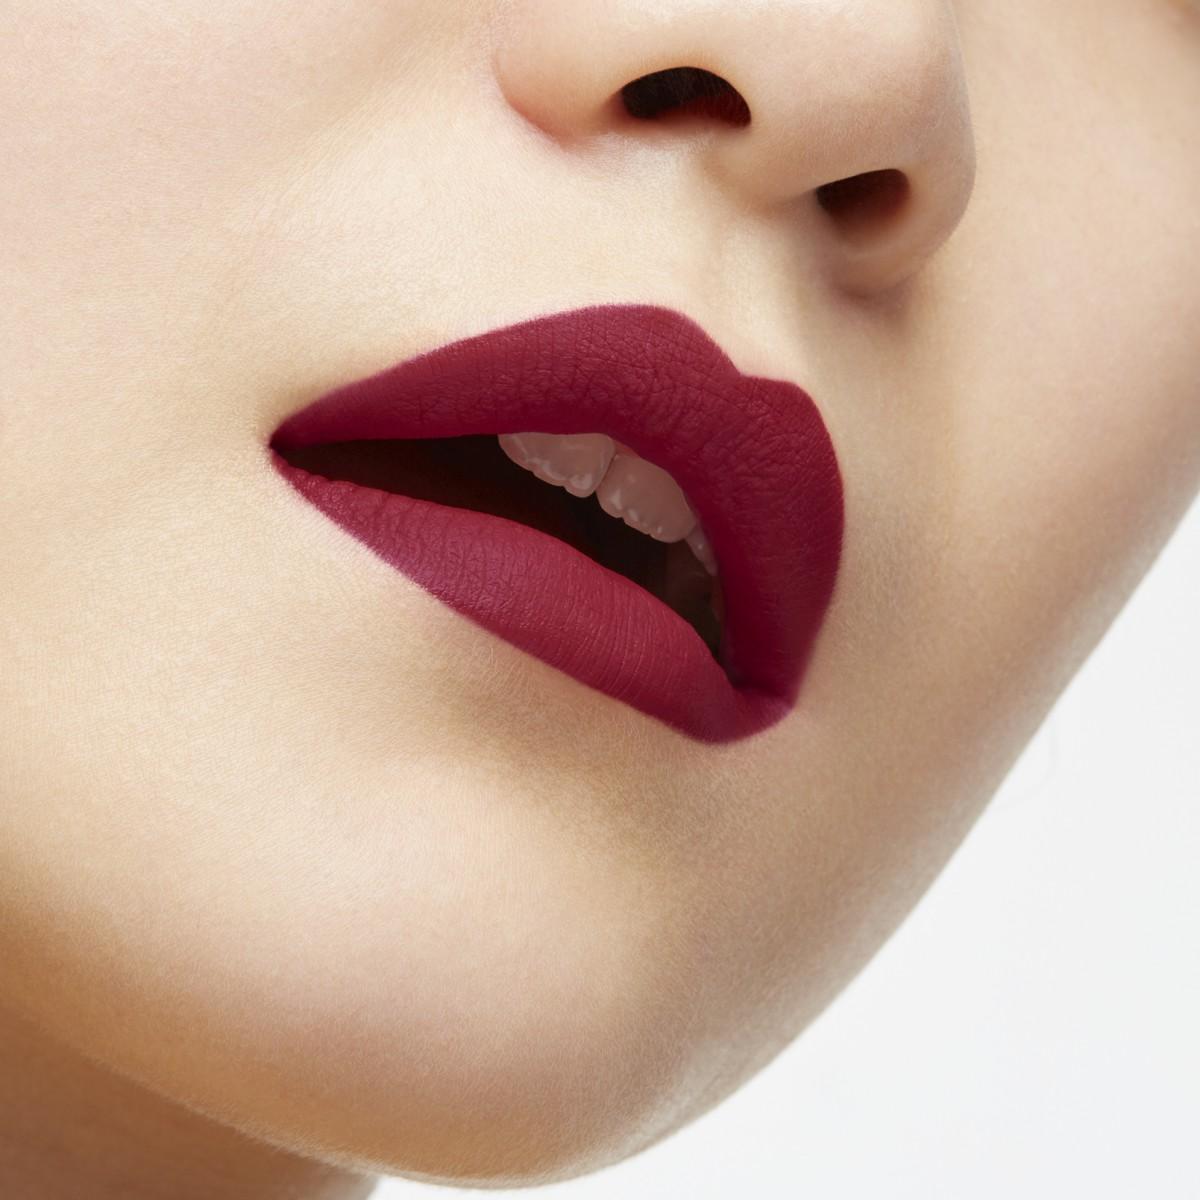 Woman Beauty - リップカラー ヴェリープライヴ 410m - Christian Louboutin